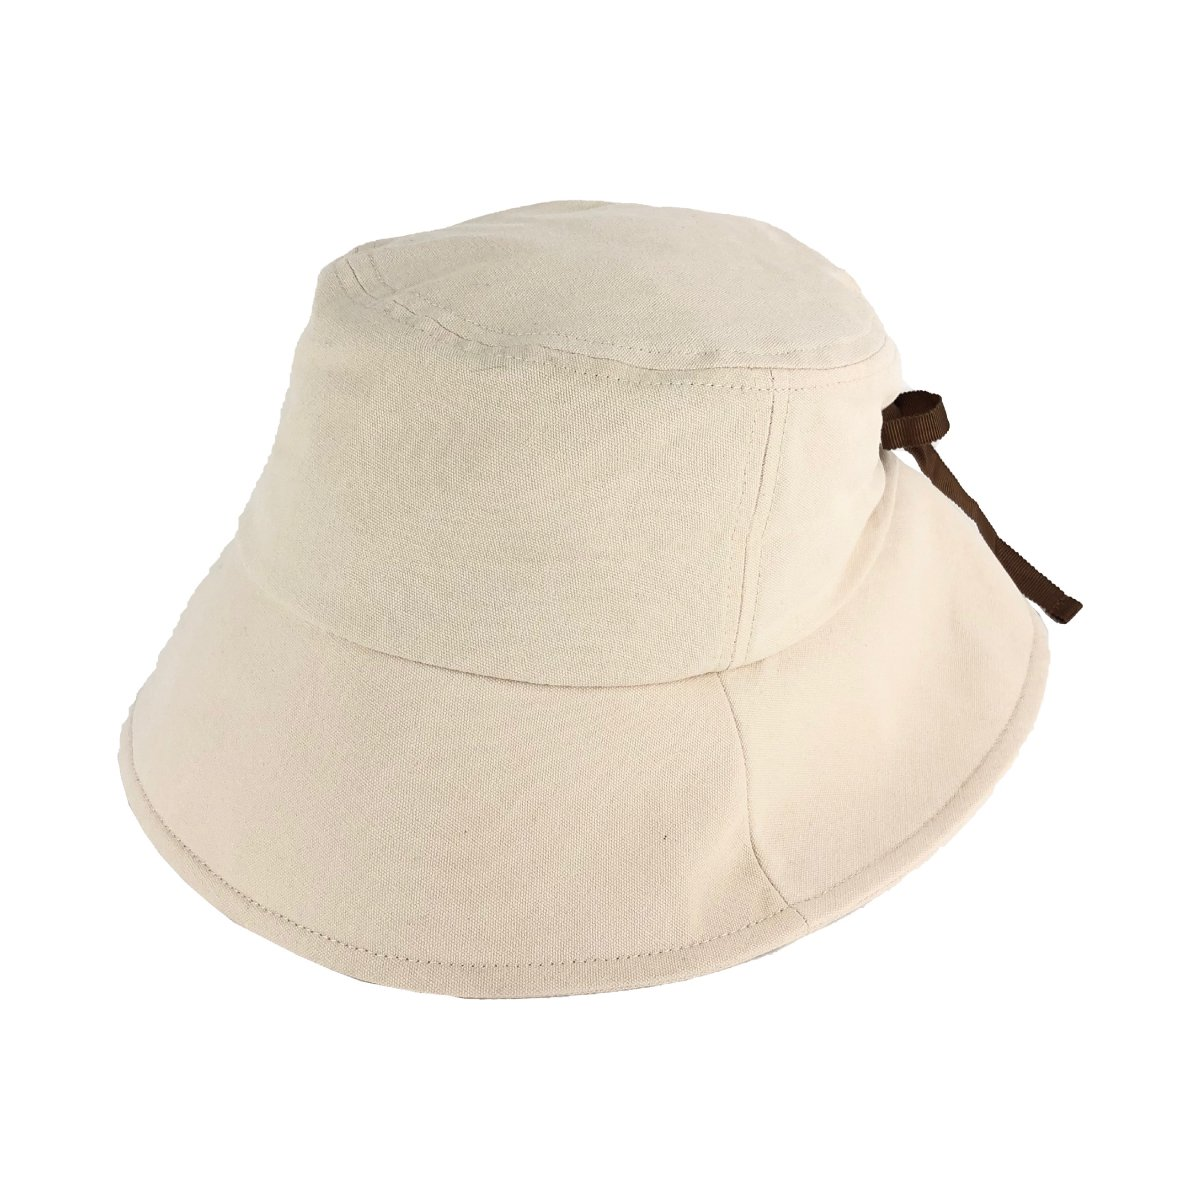 Tuck Hat 詳細画像2